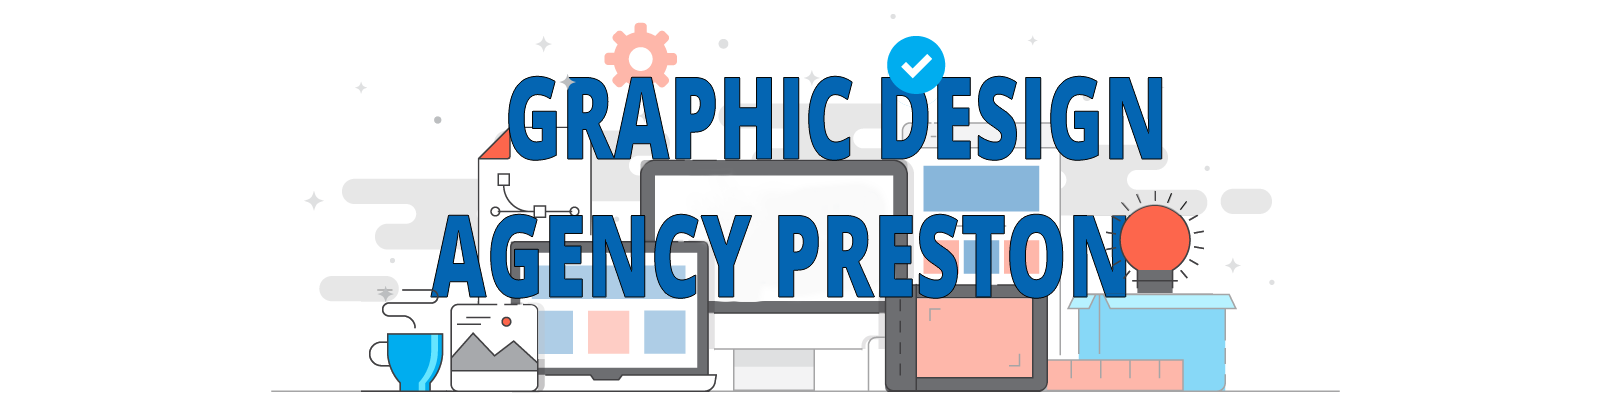 seek social graphic design agency preston header with transparent background